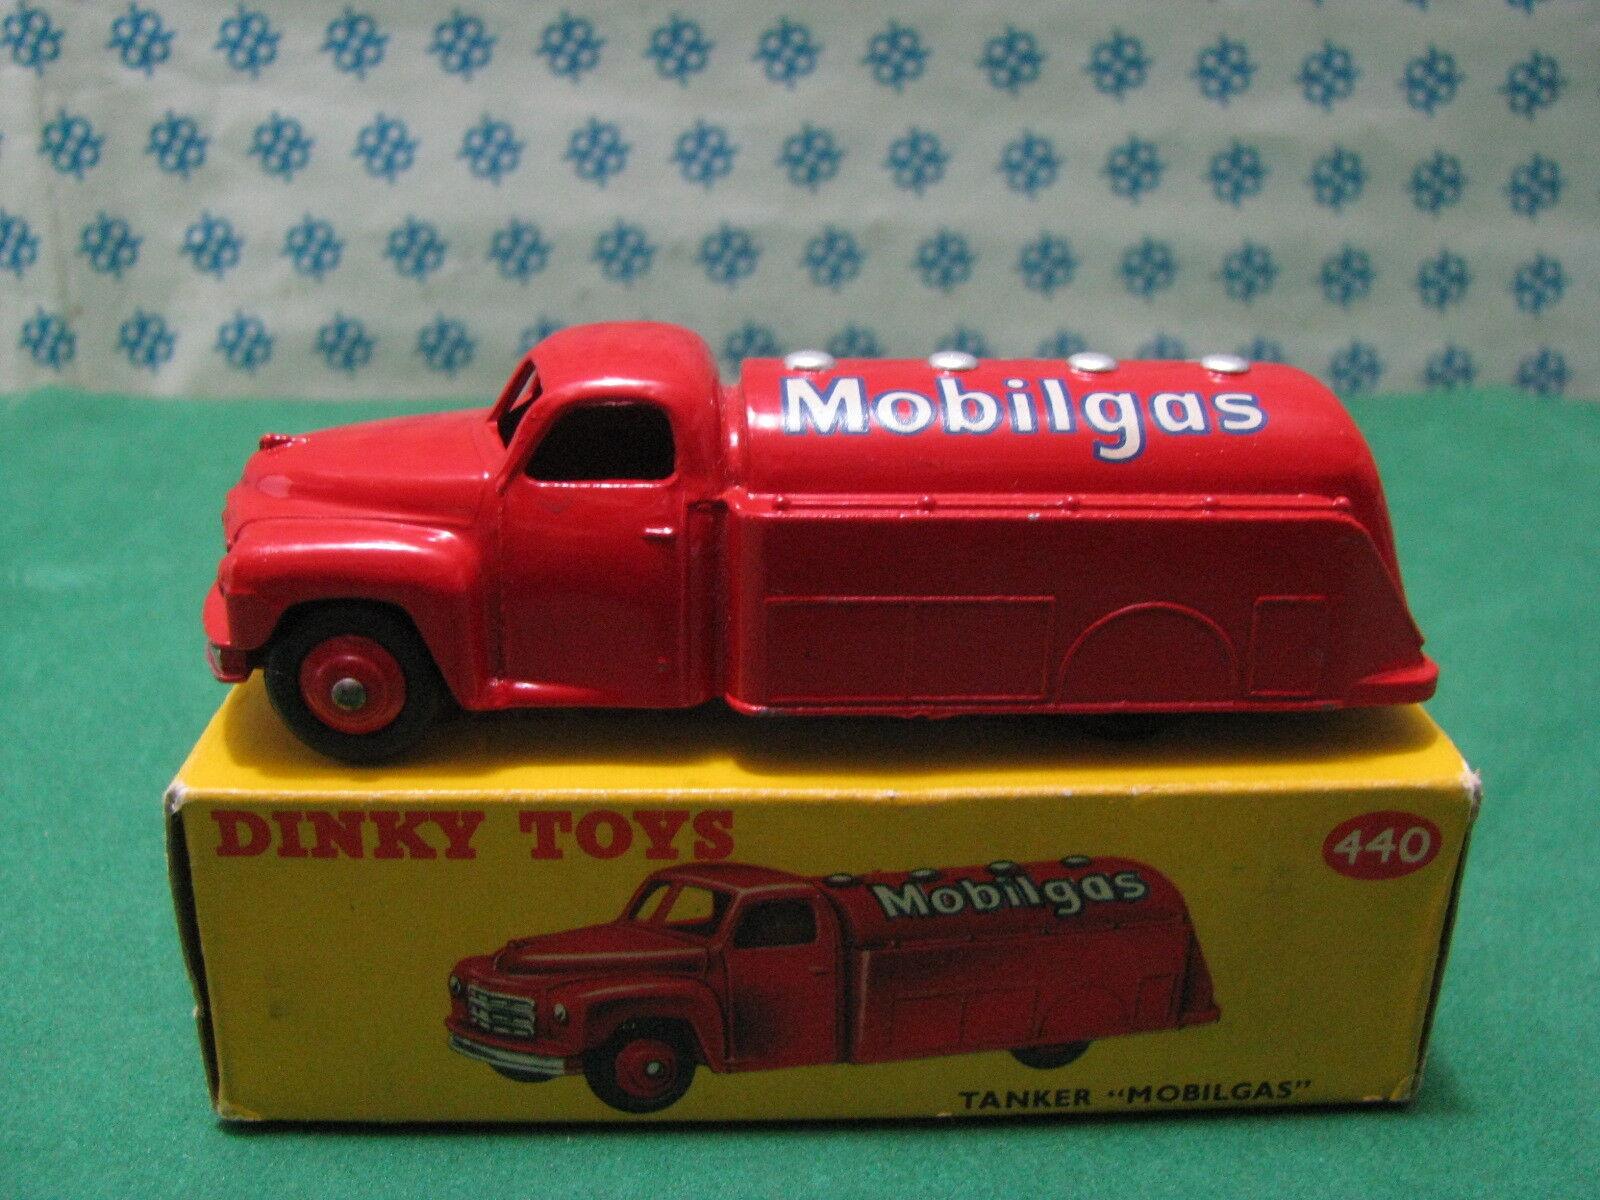 Vintage - Tanker Mobilgas - Dinky Toys 440 Nouveau   Mint Boîte